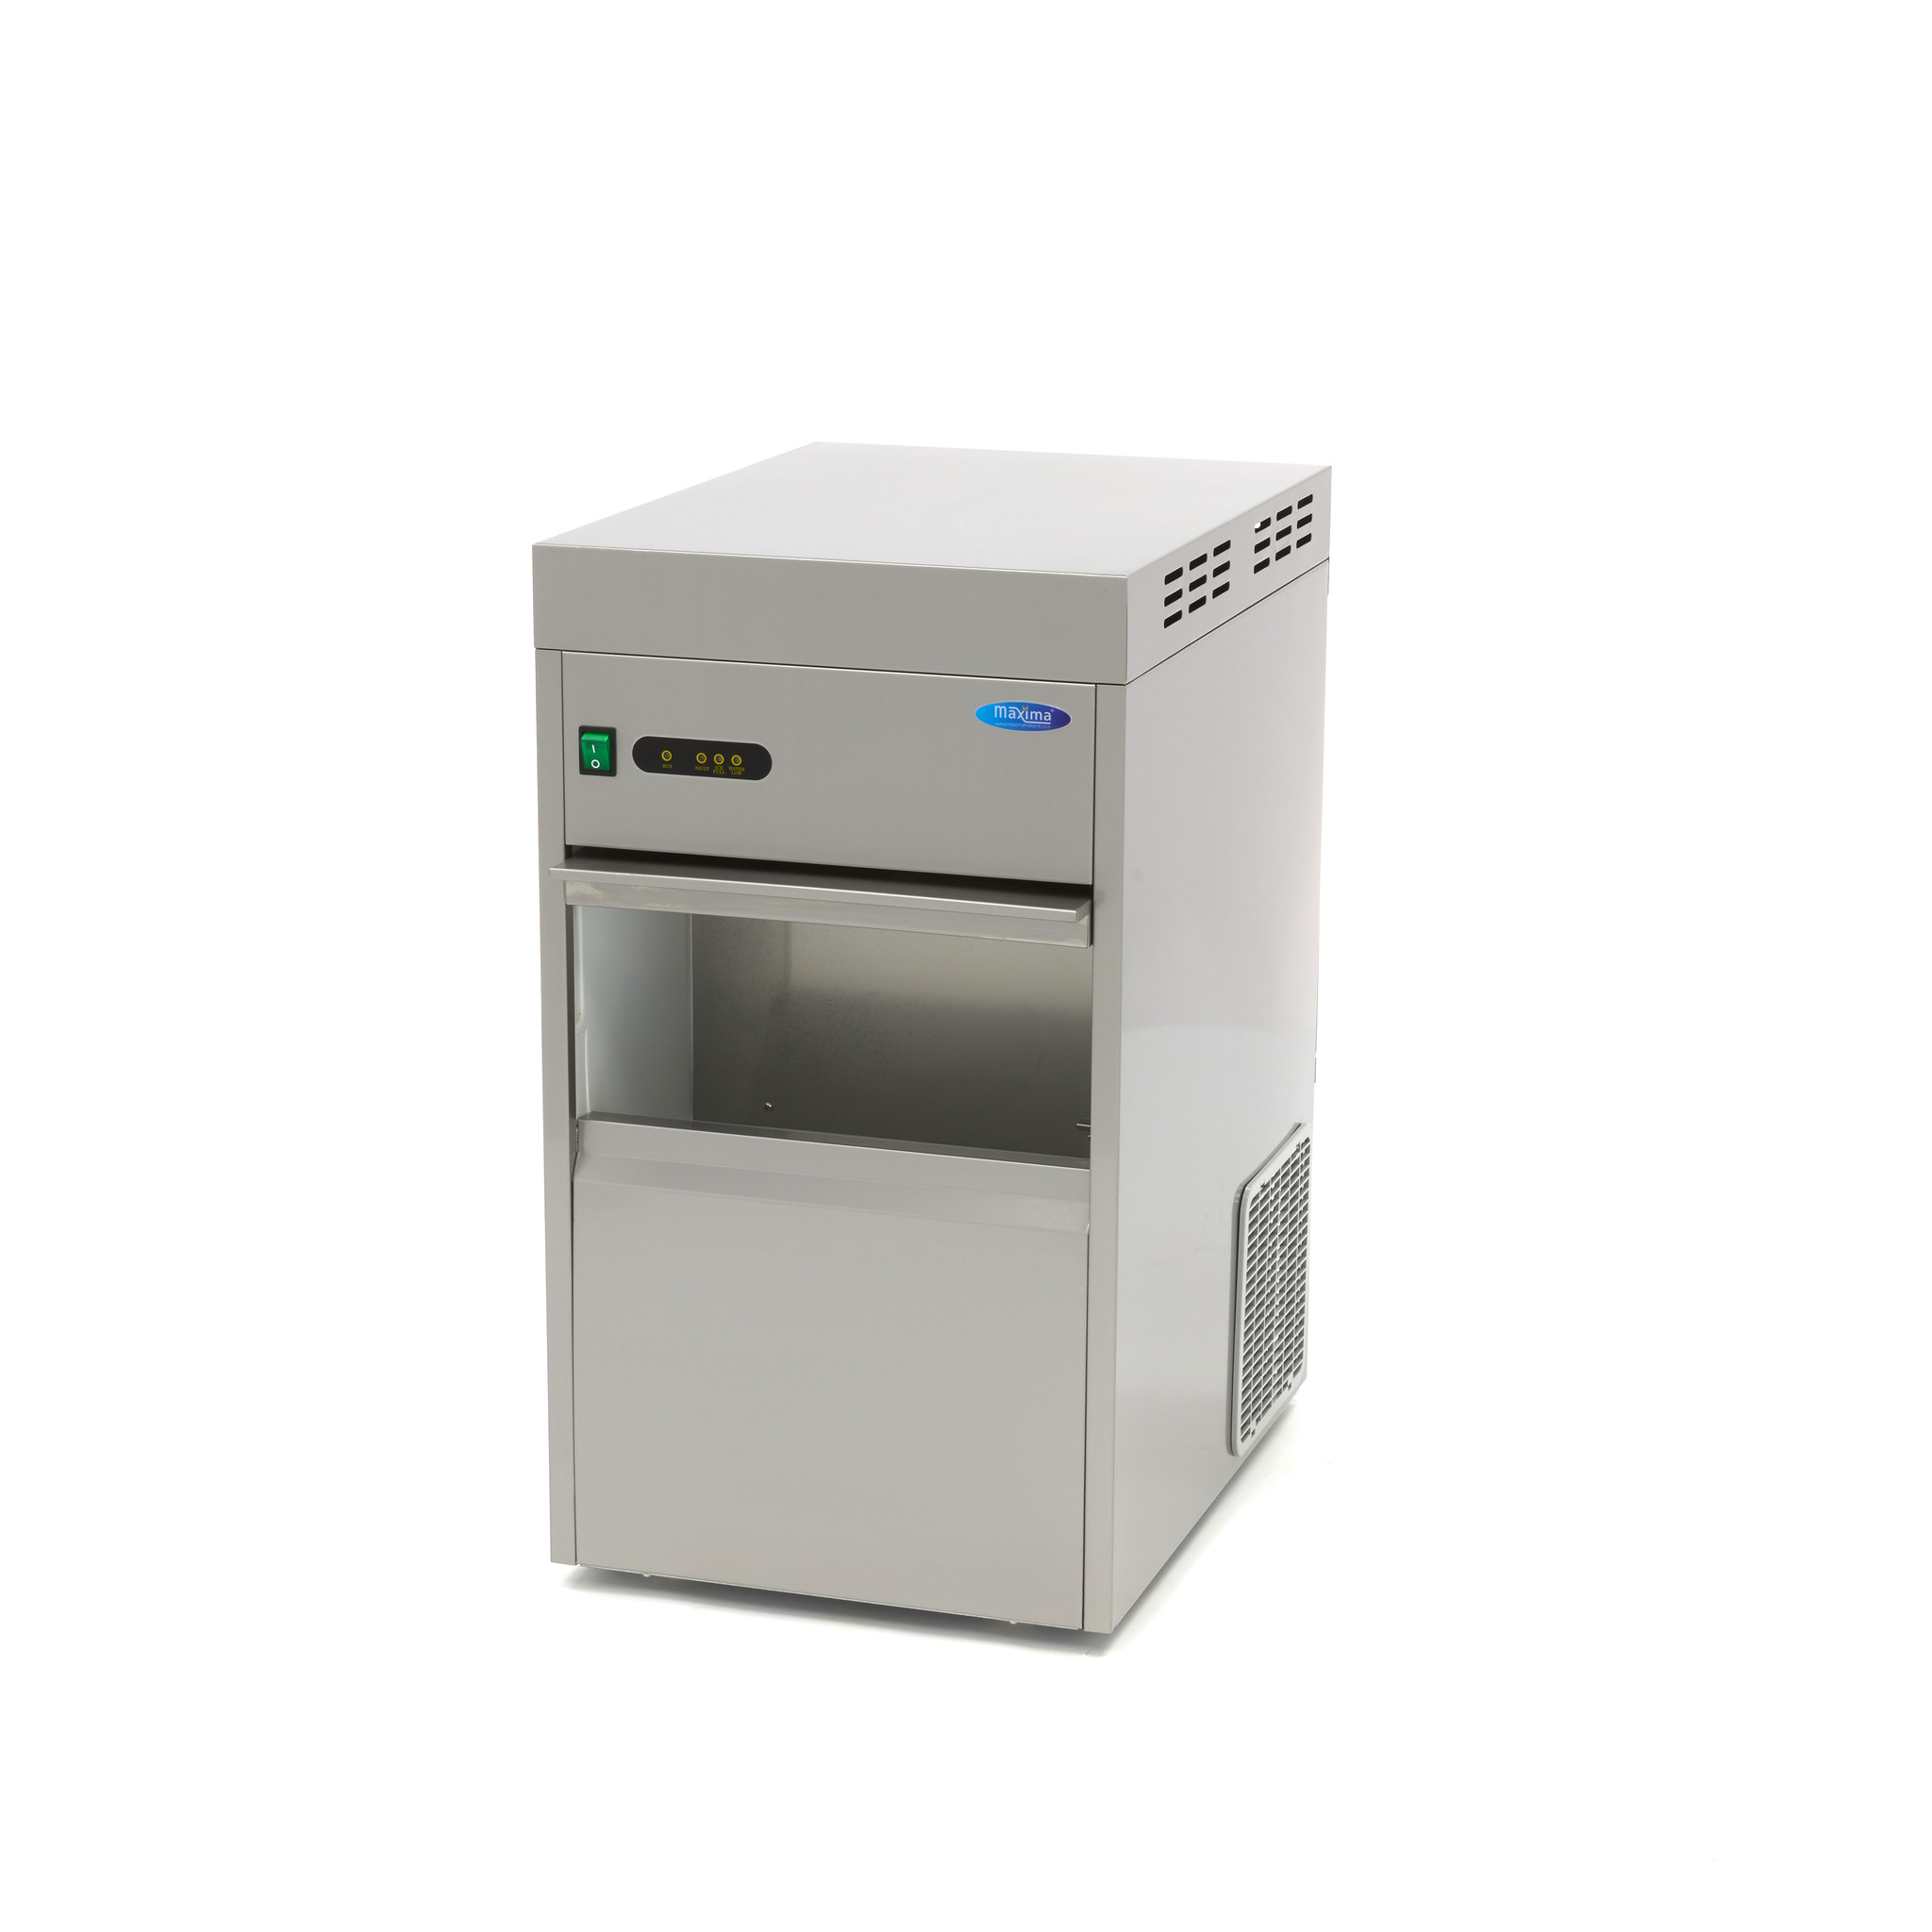 Maxima Flake Ice Crushed Ice Machine M Ice 50 Flake Maxima Kitchen Equipment